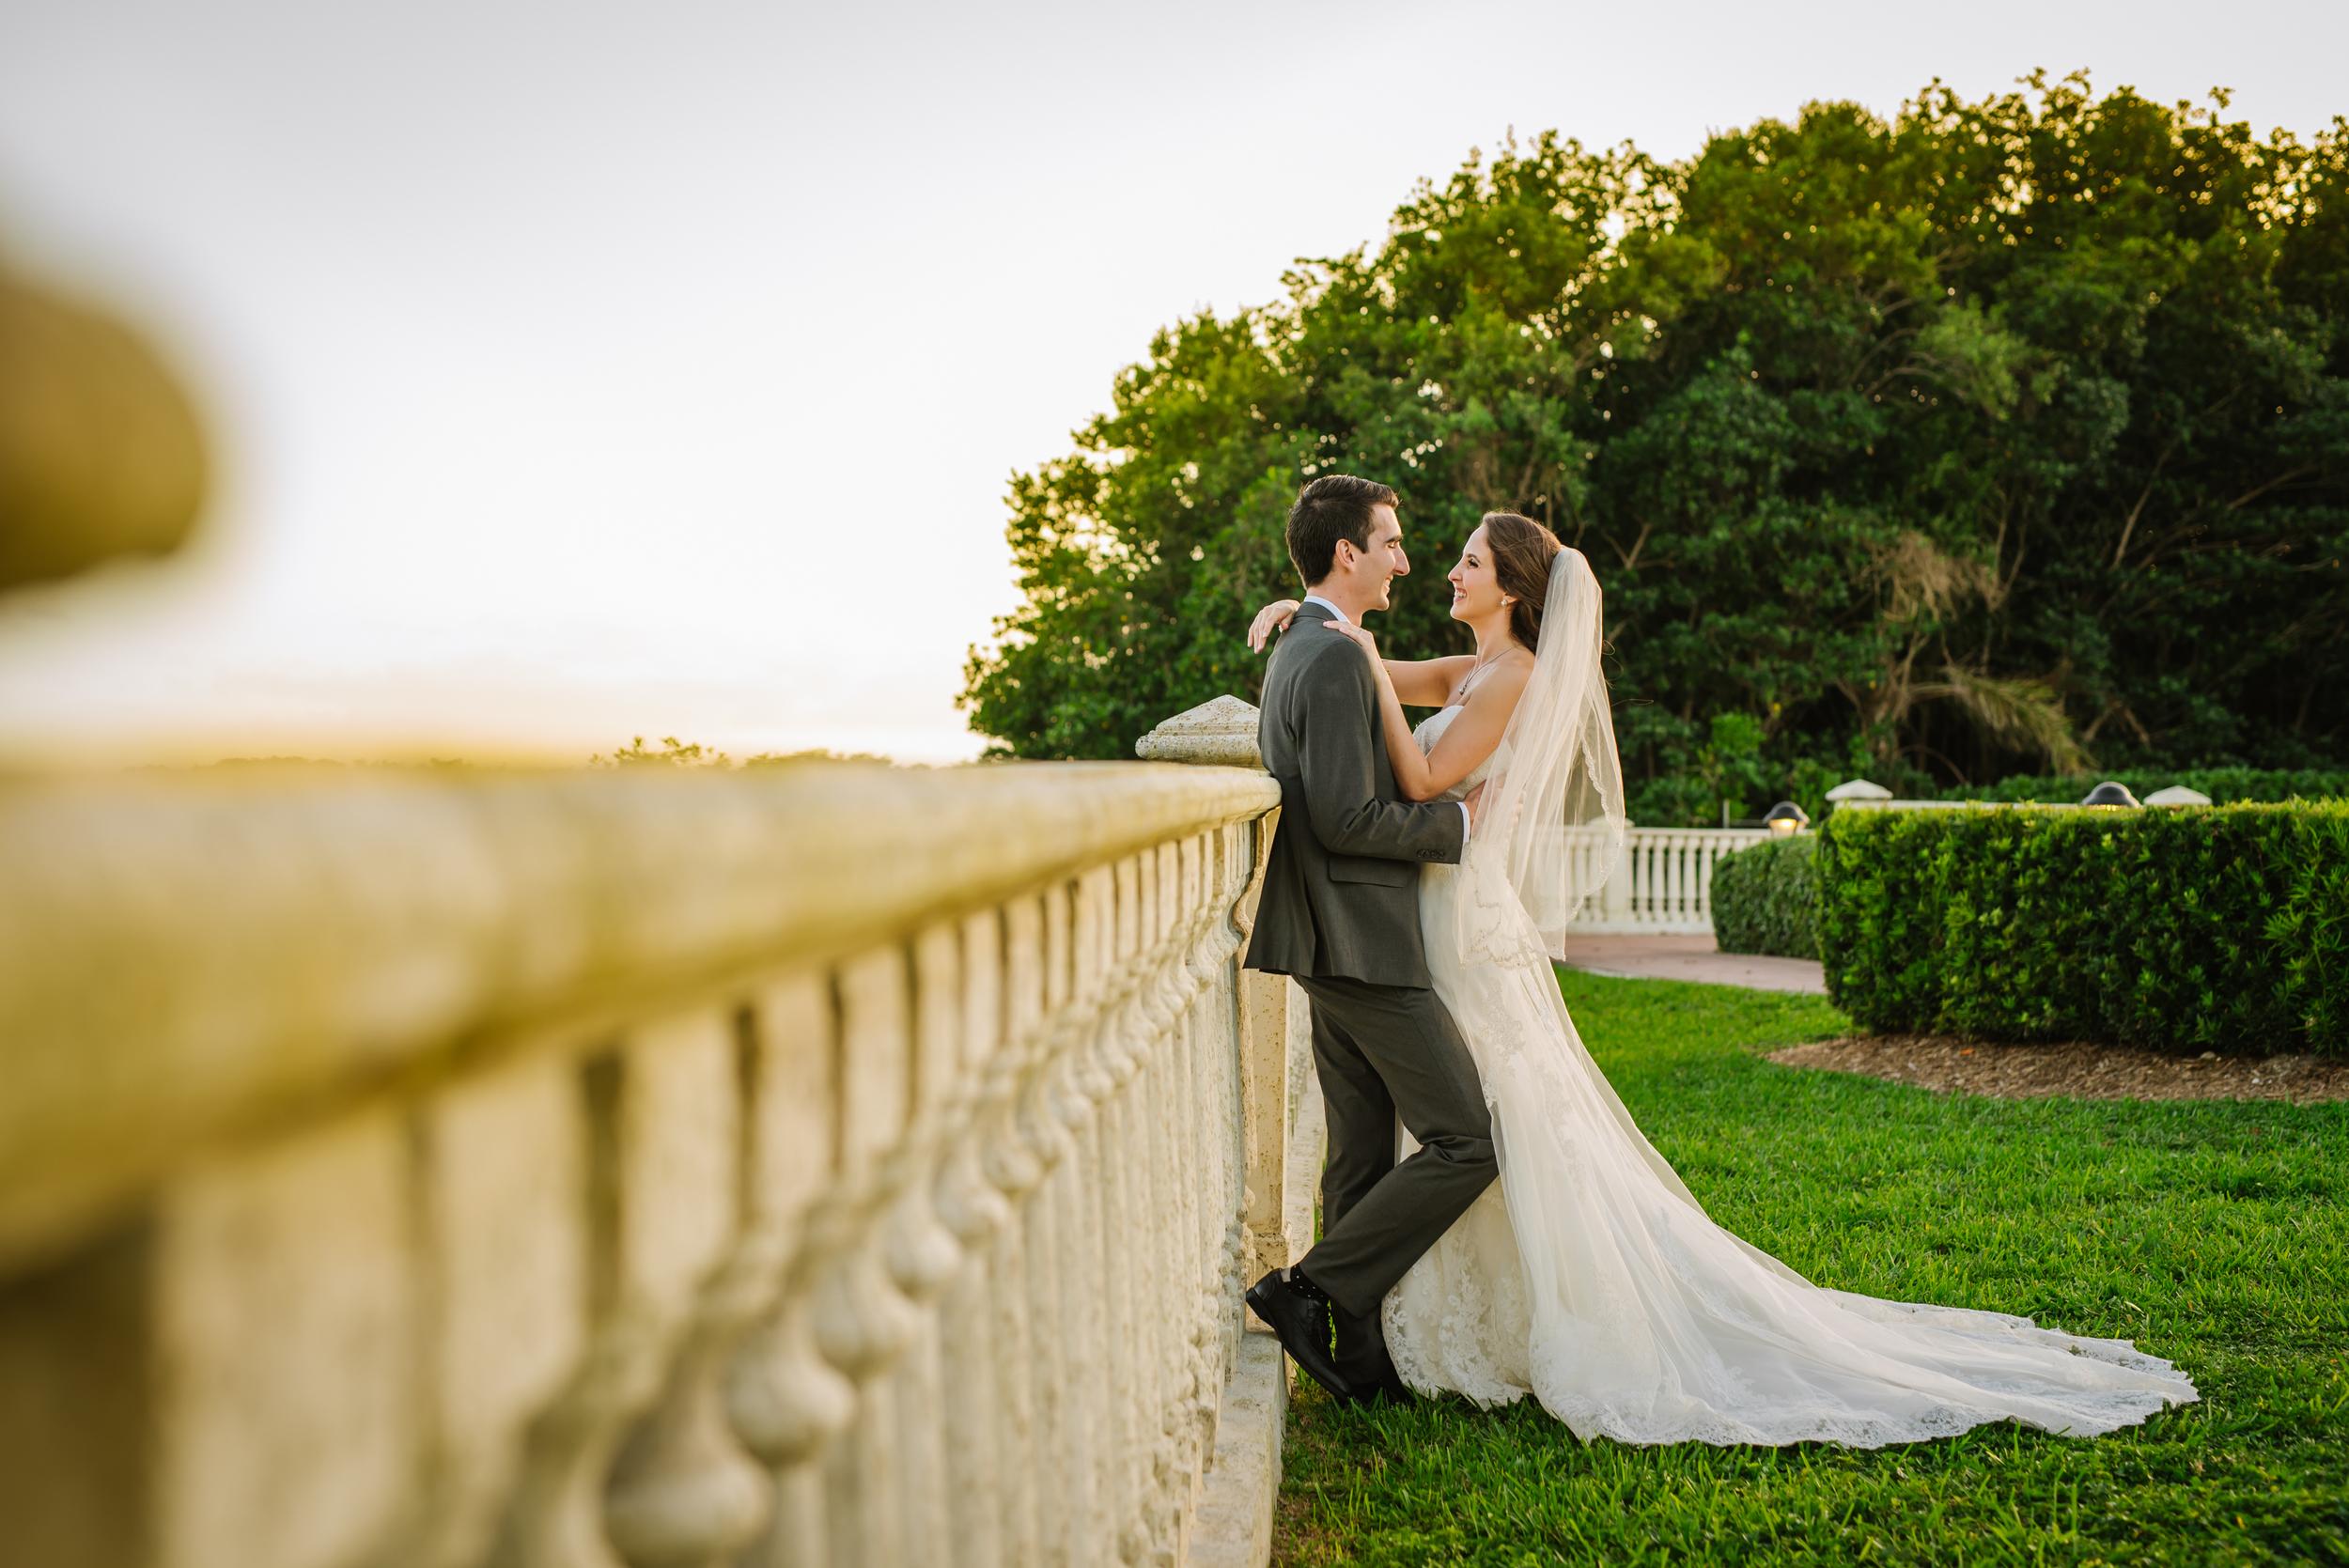 tampa-wedding-photographer-thalatta-estate-miami-bride-groom-portrait-vibrant-creative